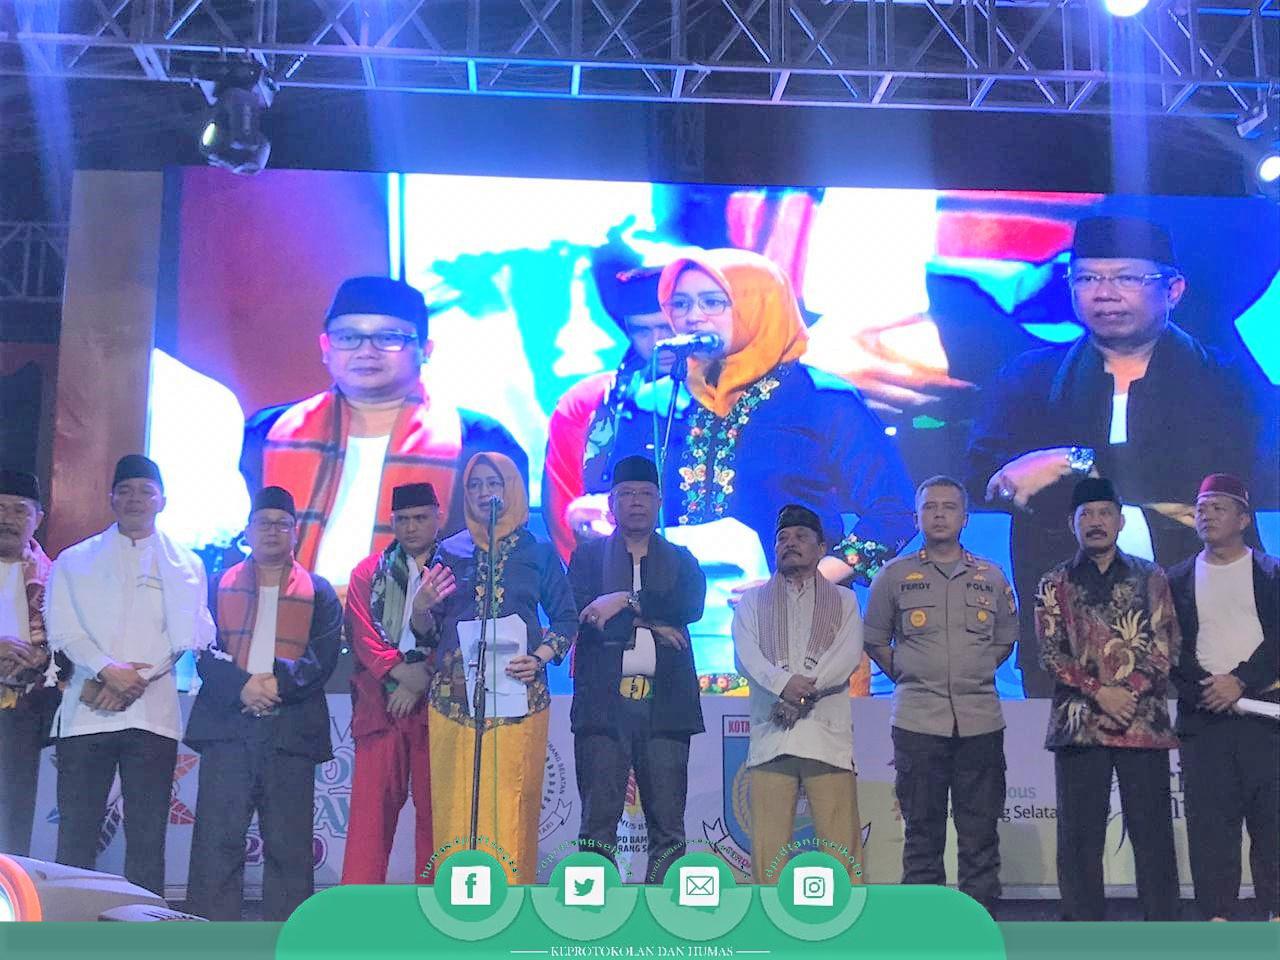 Pimpinan DPRD Turut Meriahkan Festival Lenong Betawi 2019